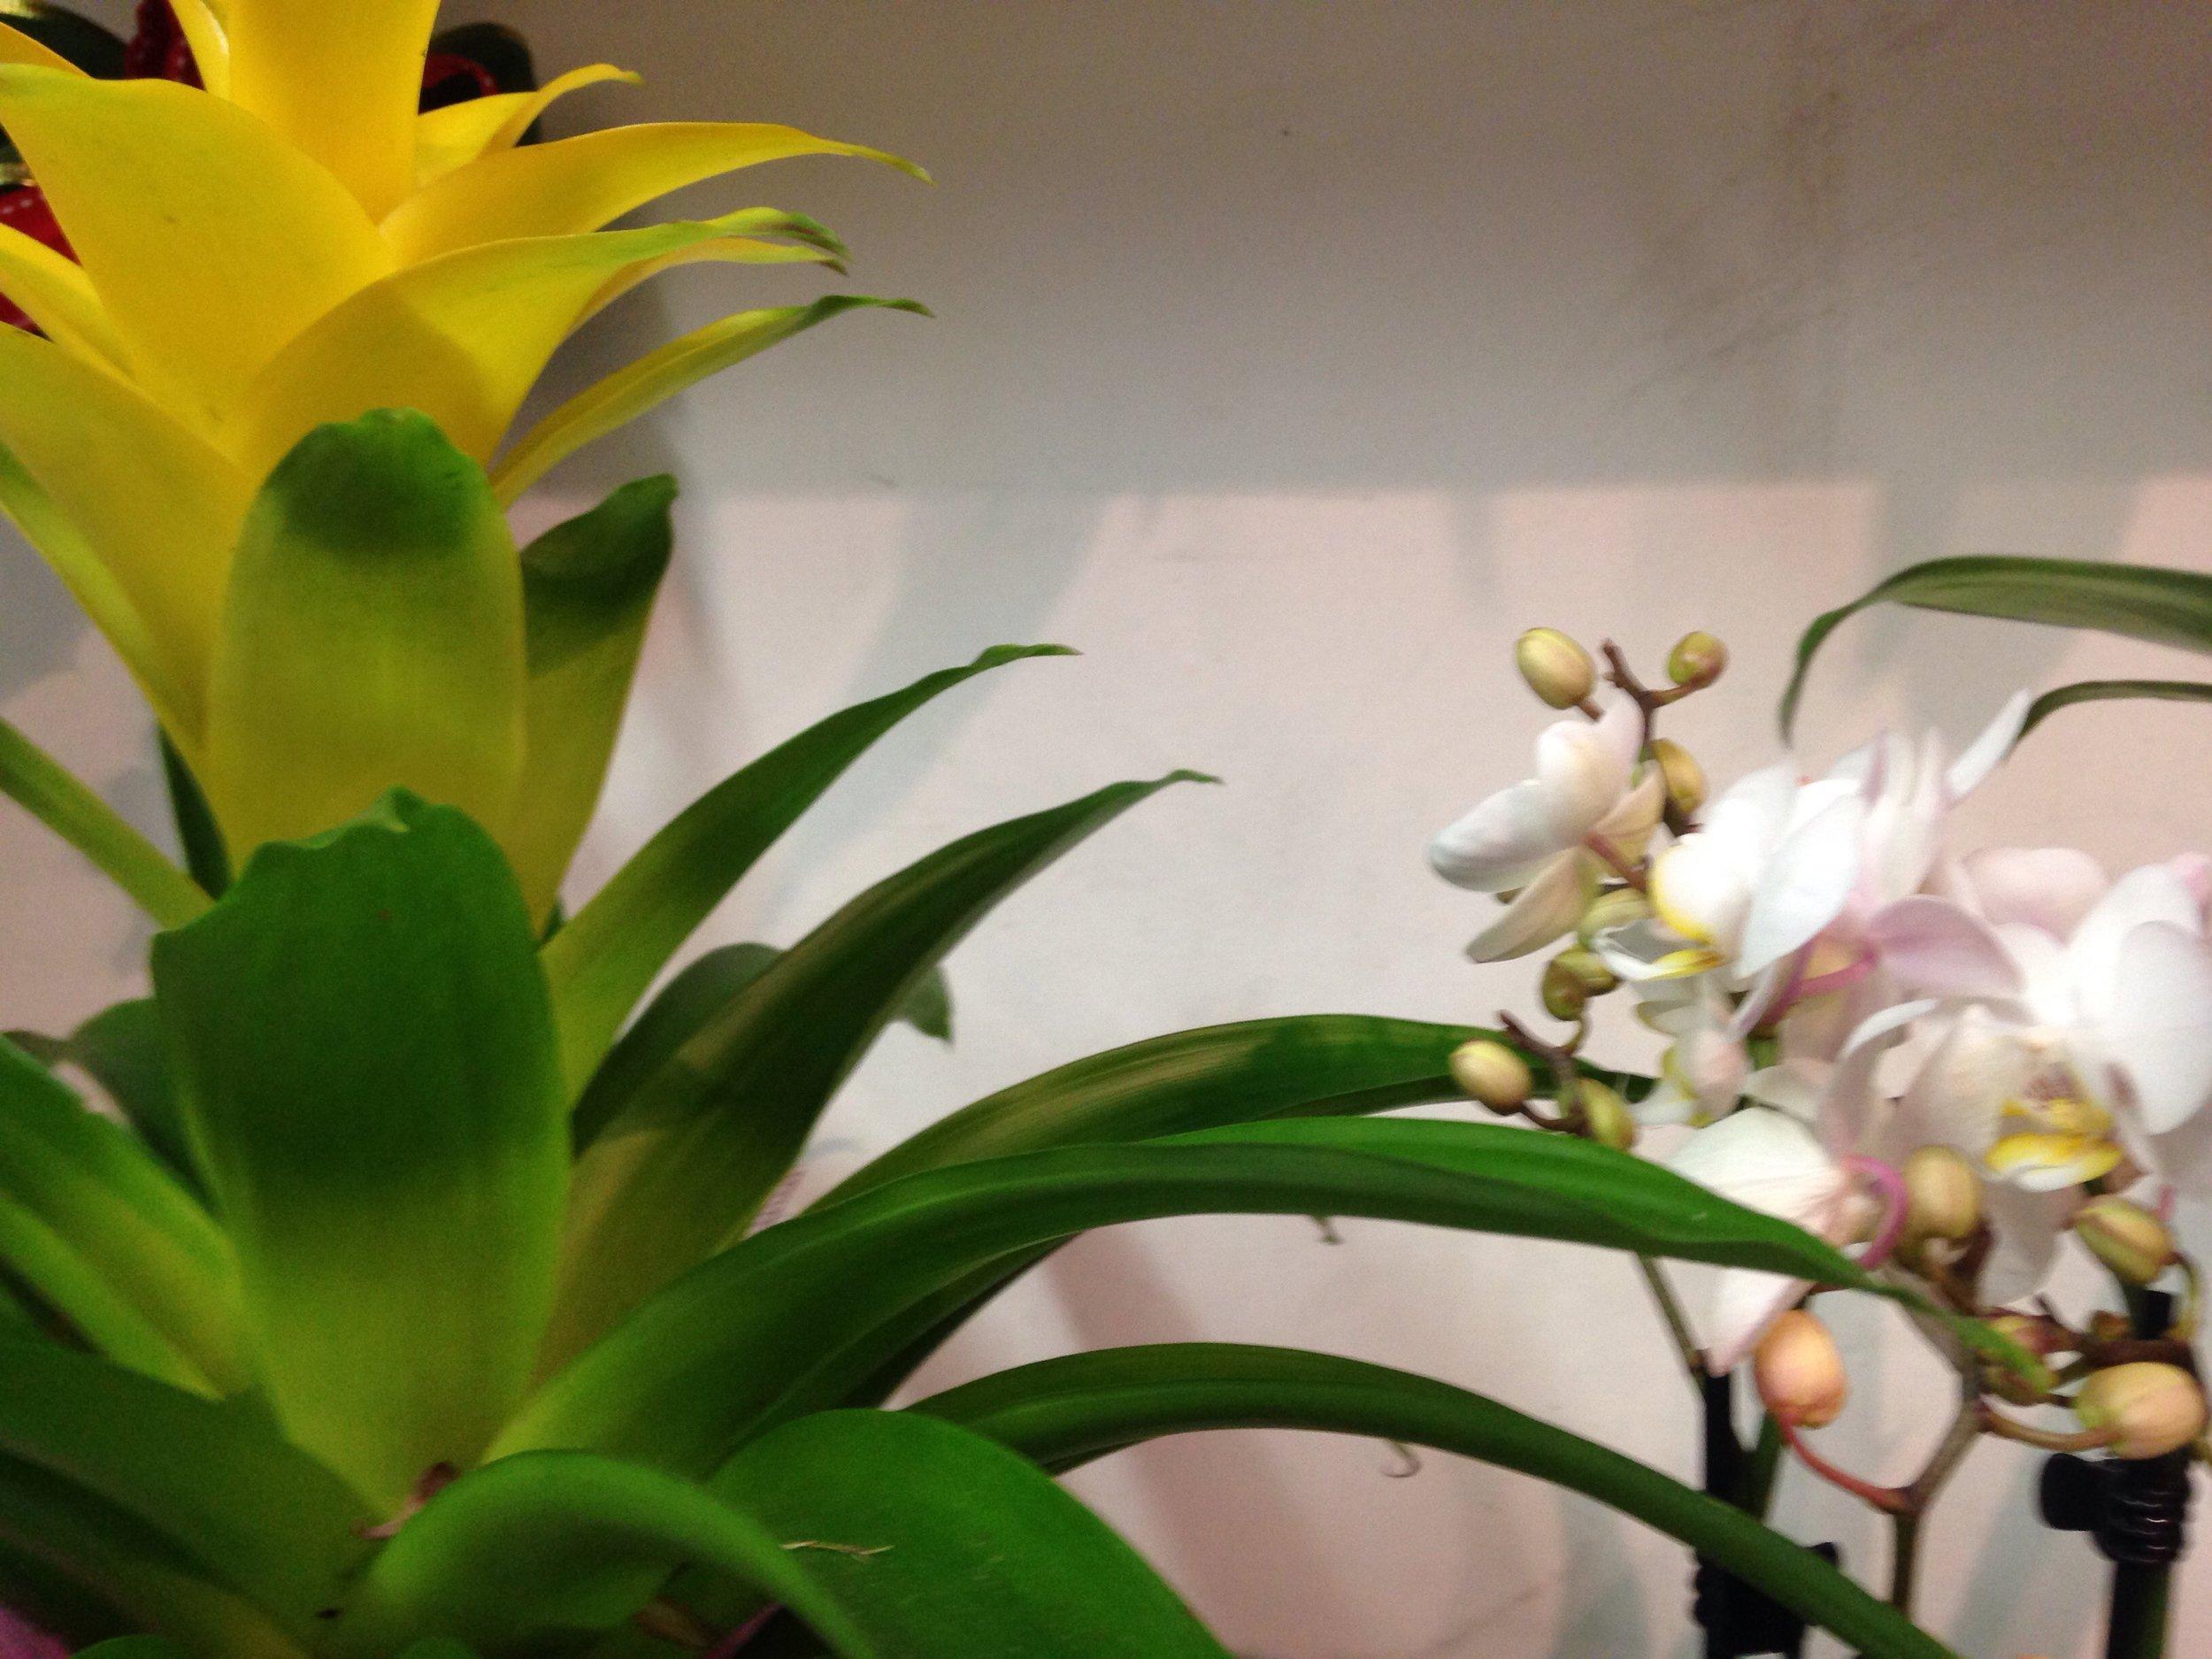 Fiori, fiori dappertutto!